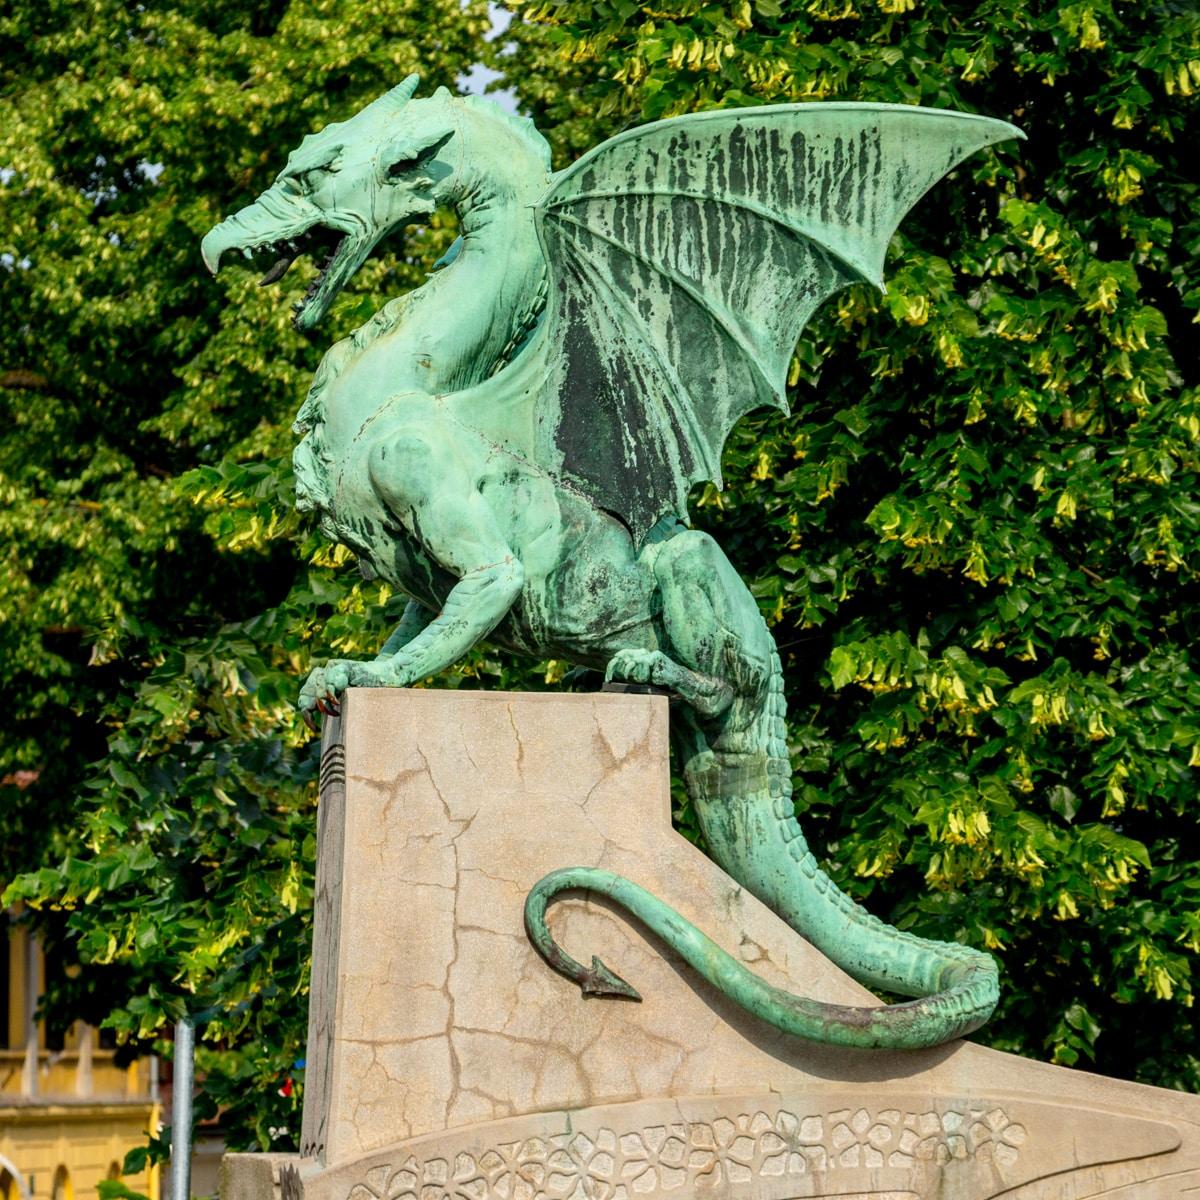 One of four dragons on the Dragon Bridge.